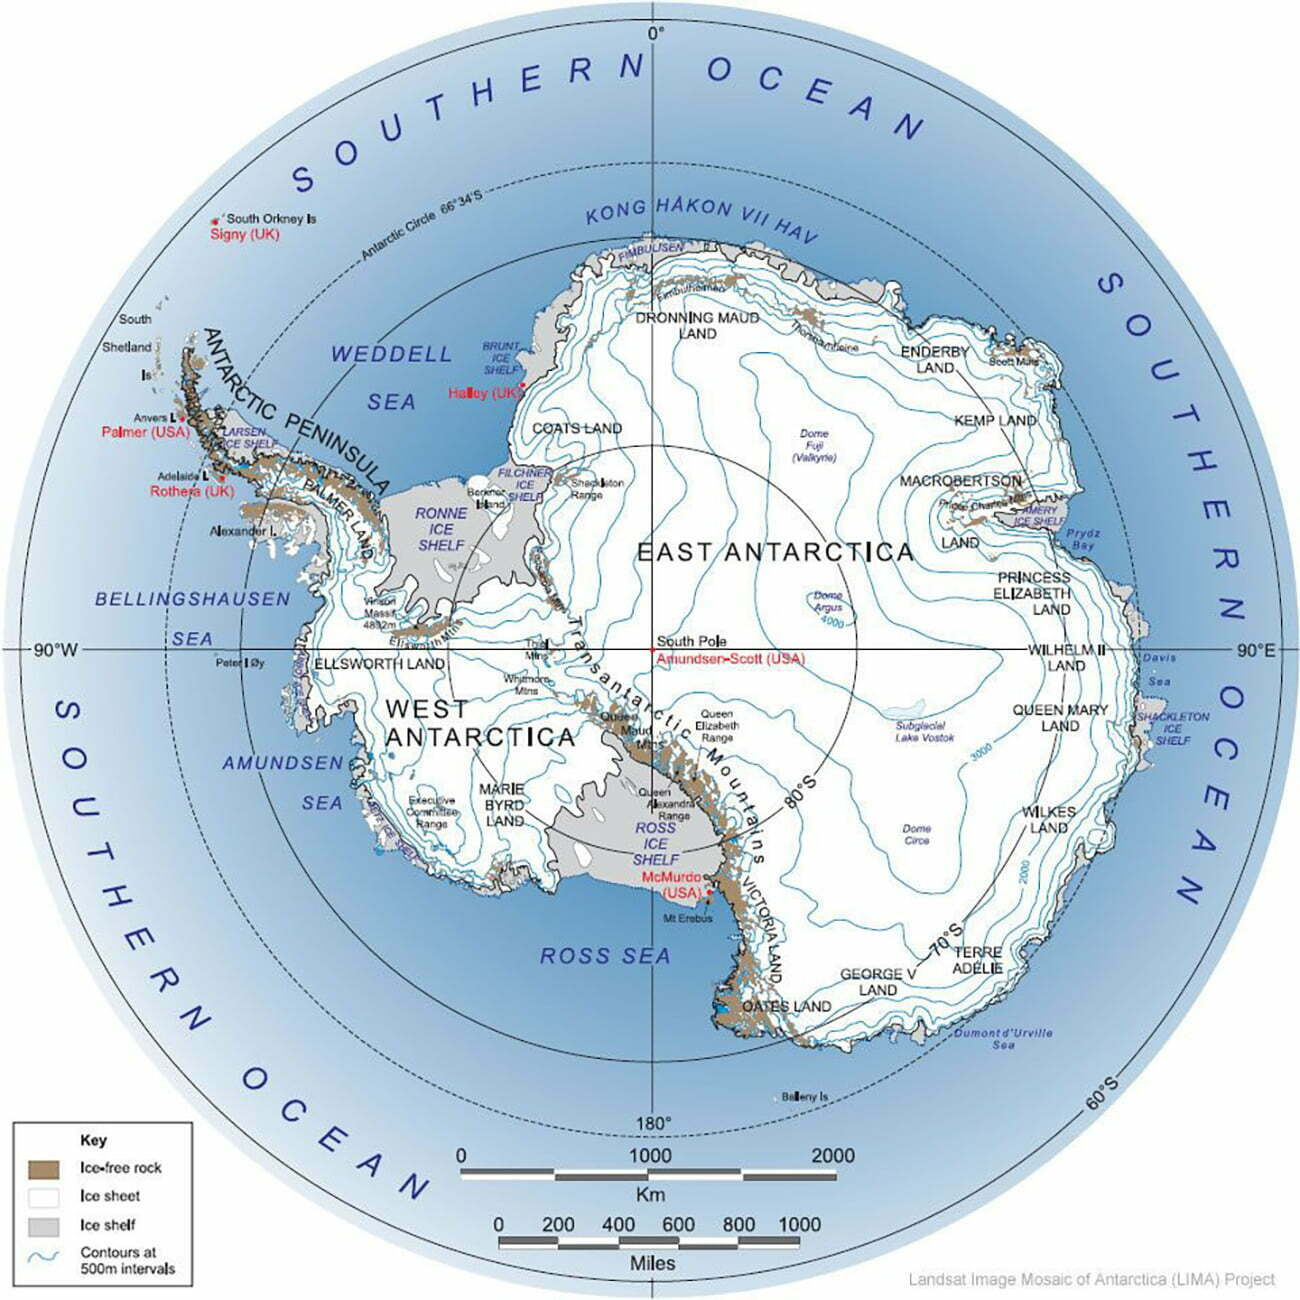 mapa da Antártica